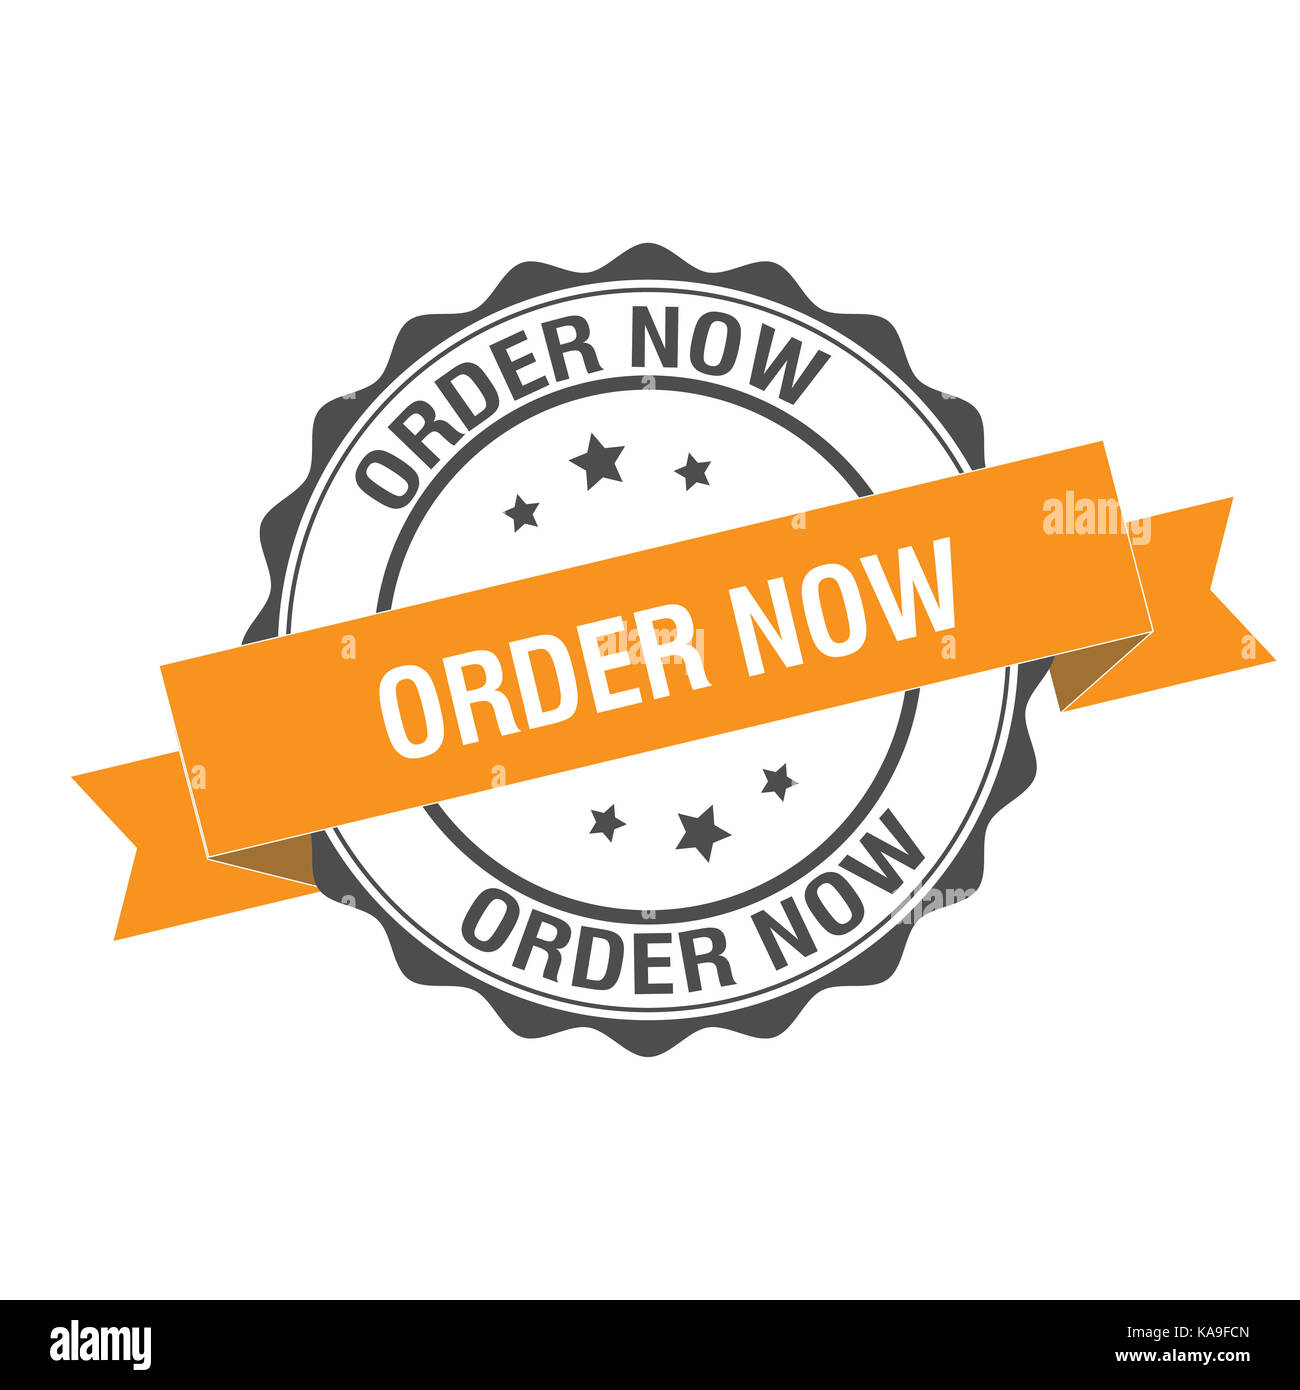 Order now stamp illustration Stock Photo